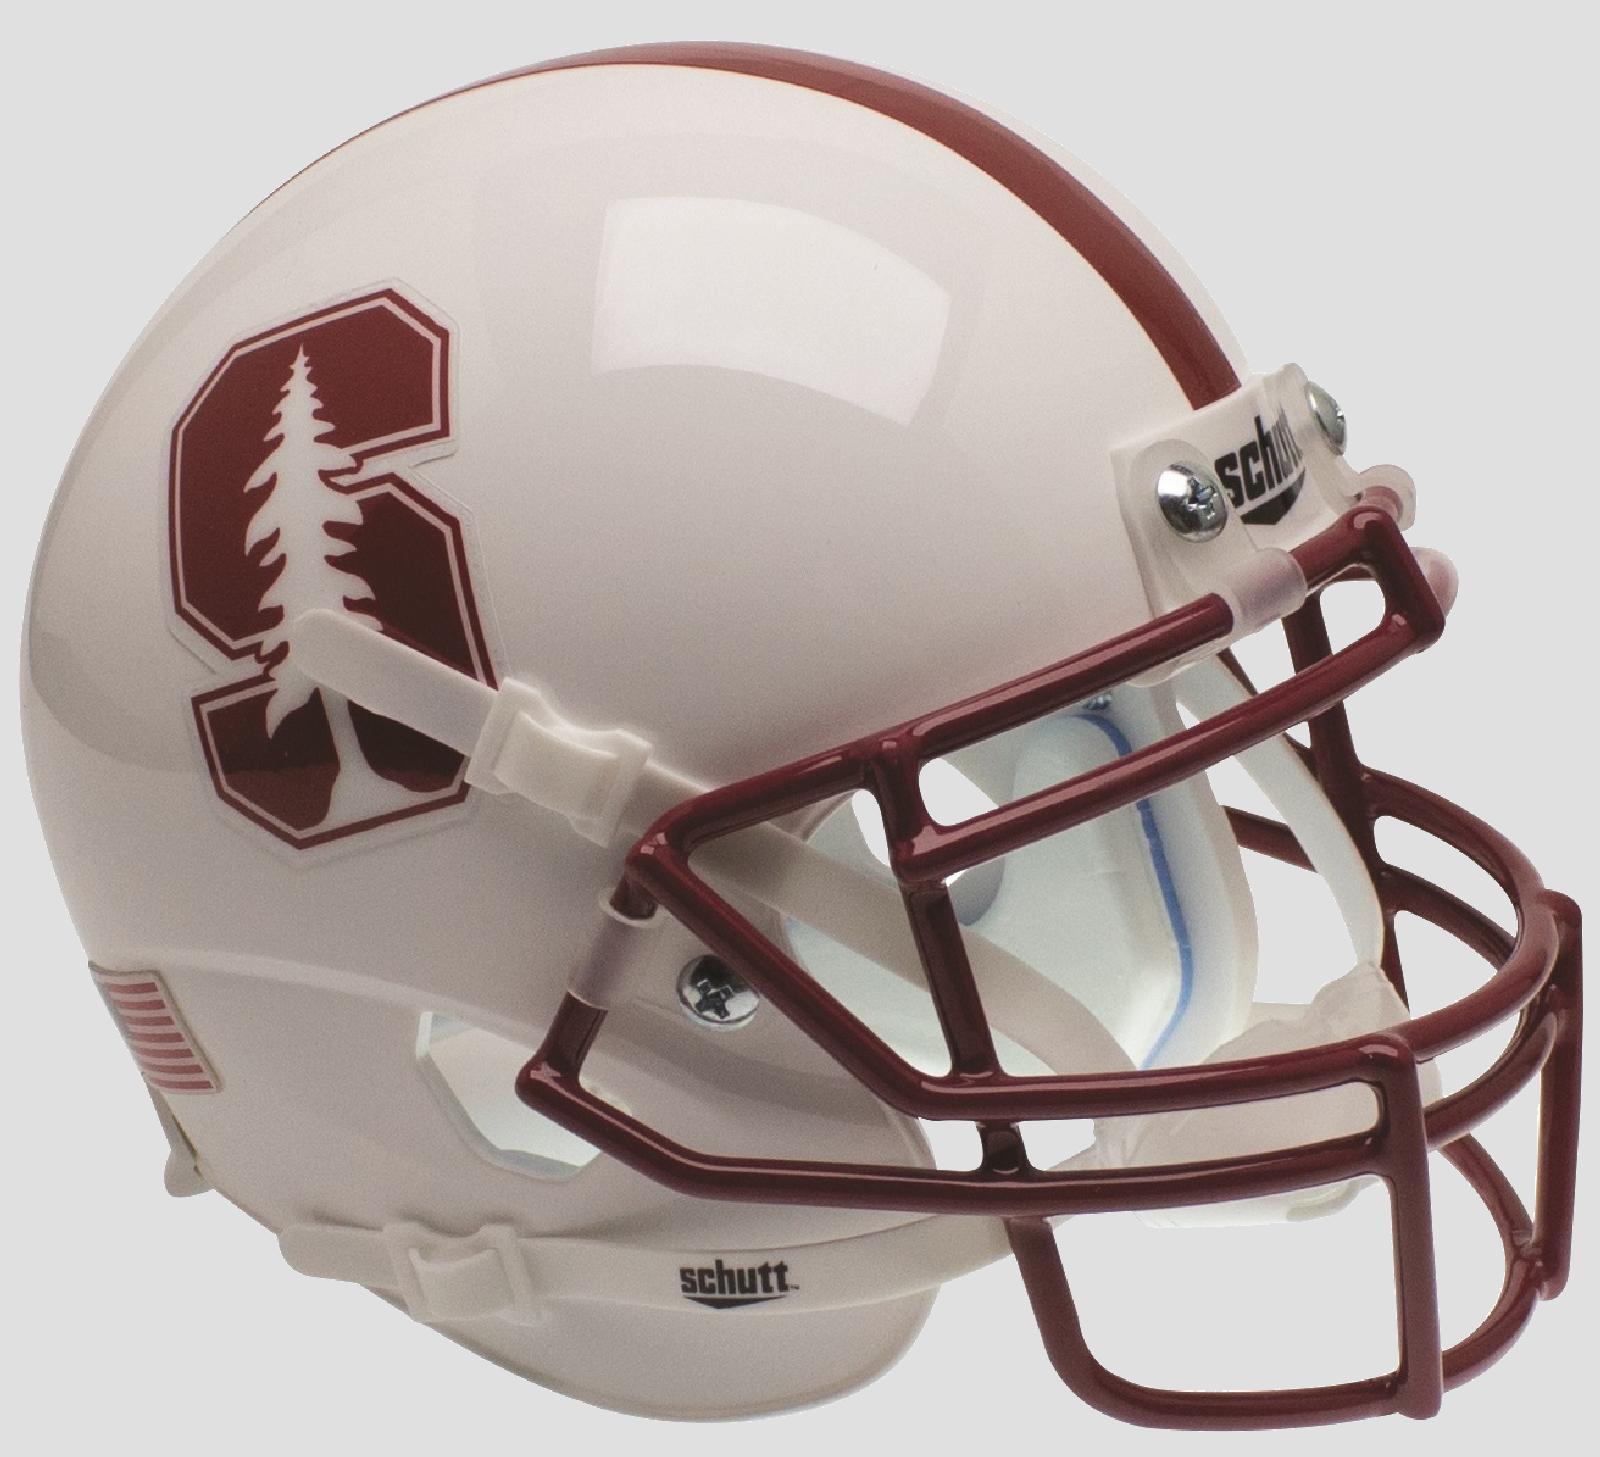 Stanford Cardinal Mini XP Authentic Helmet Schutt <B>White with Tree</B>